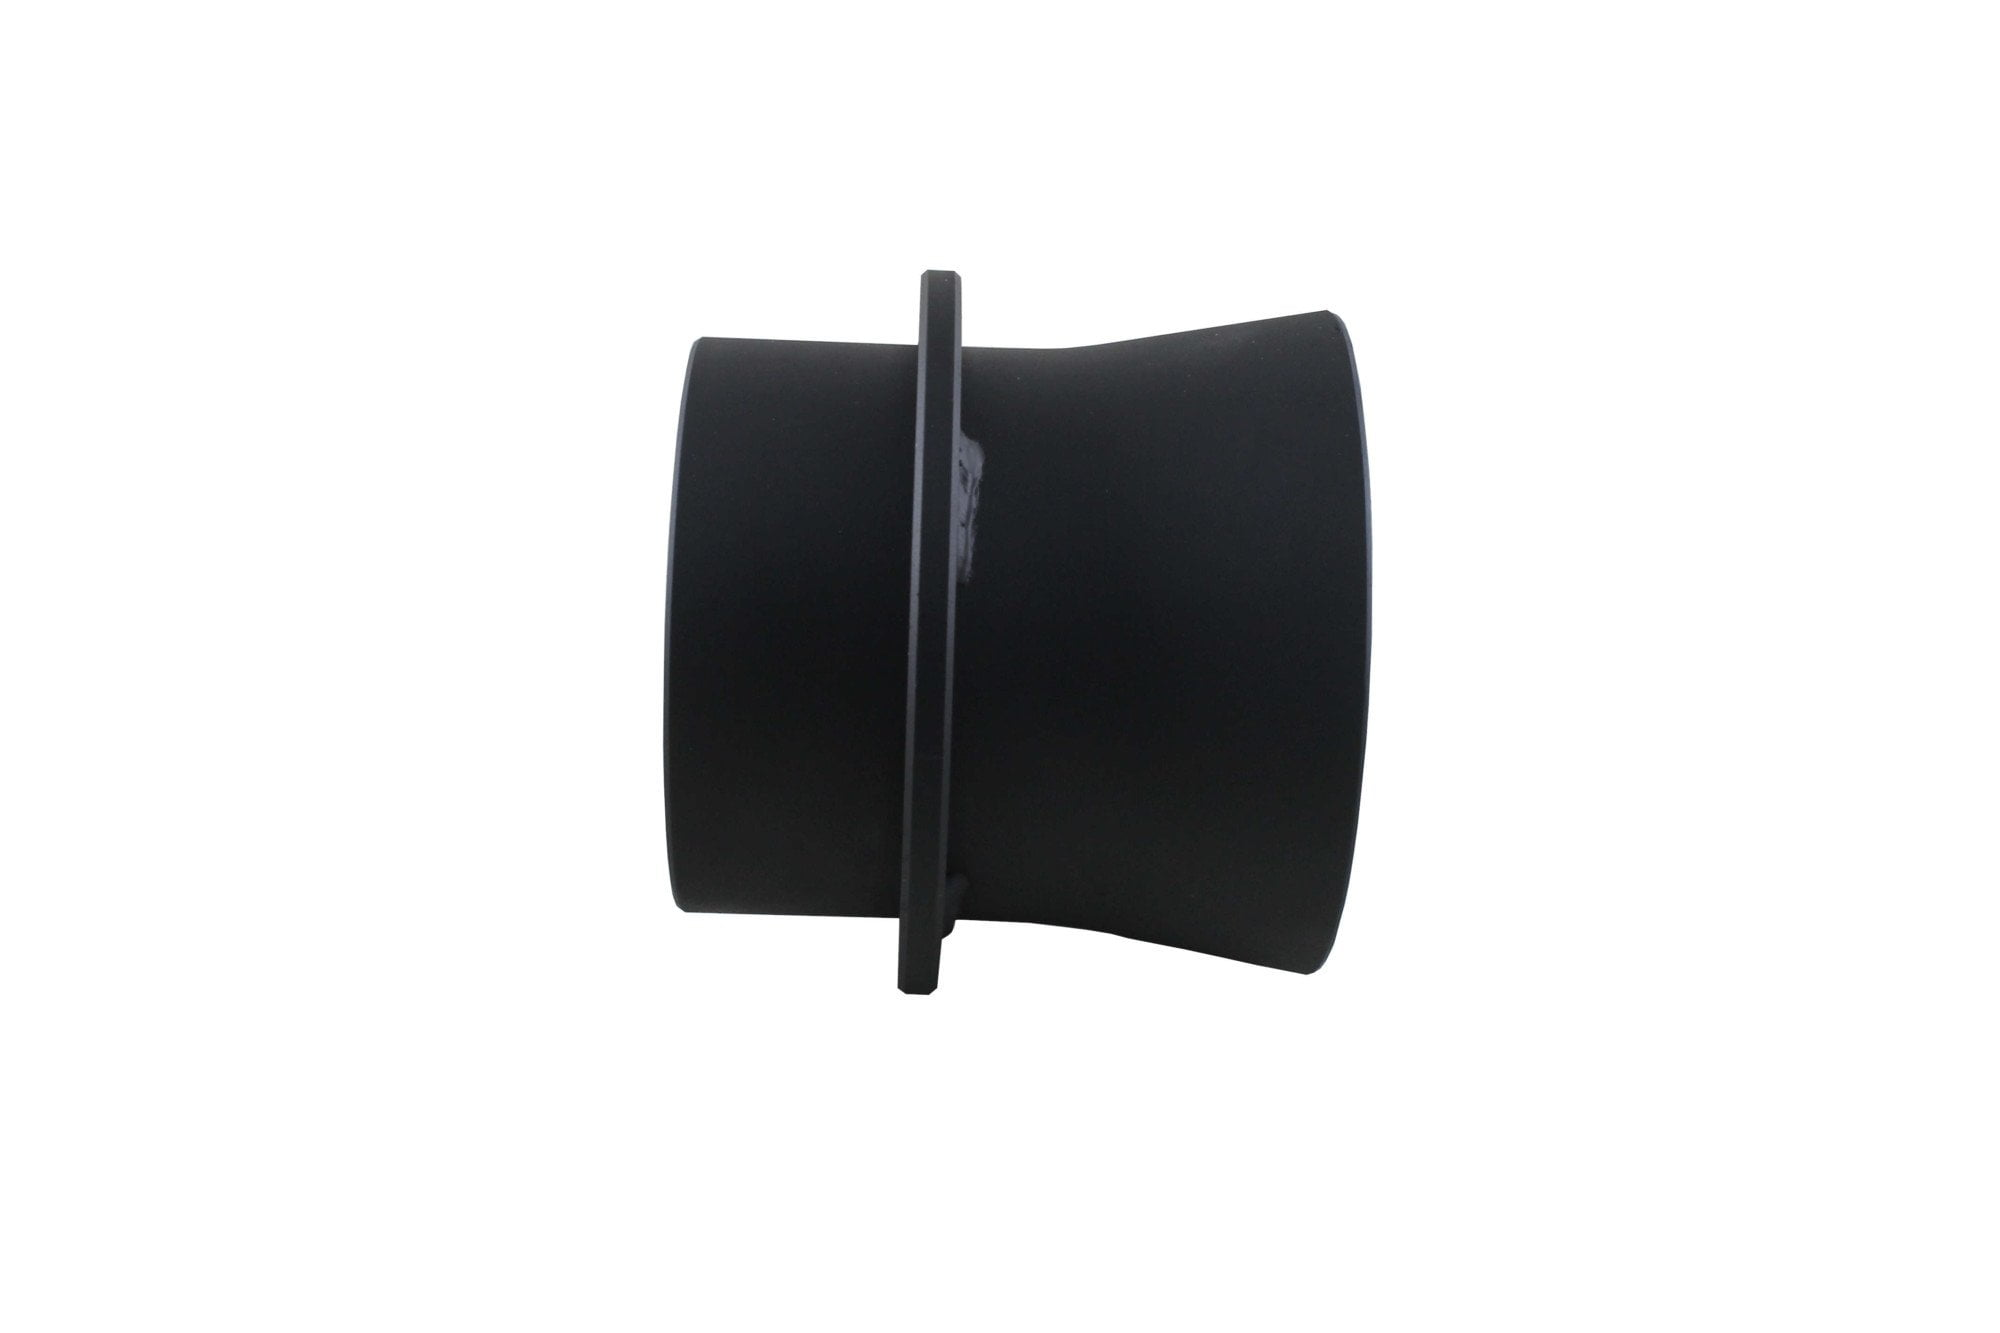 Cadman Kobling - Adapter side